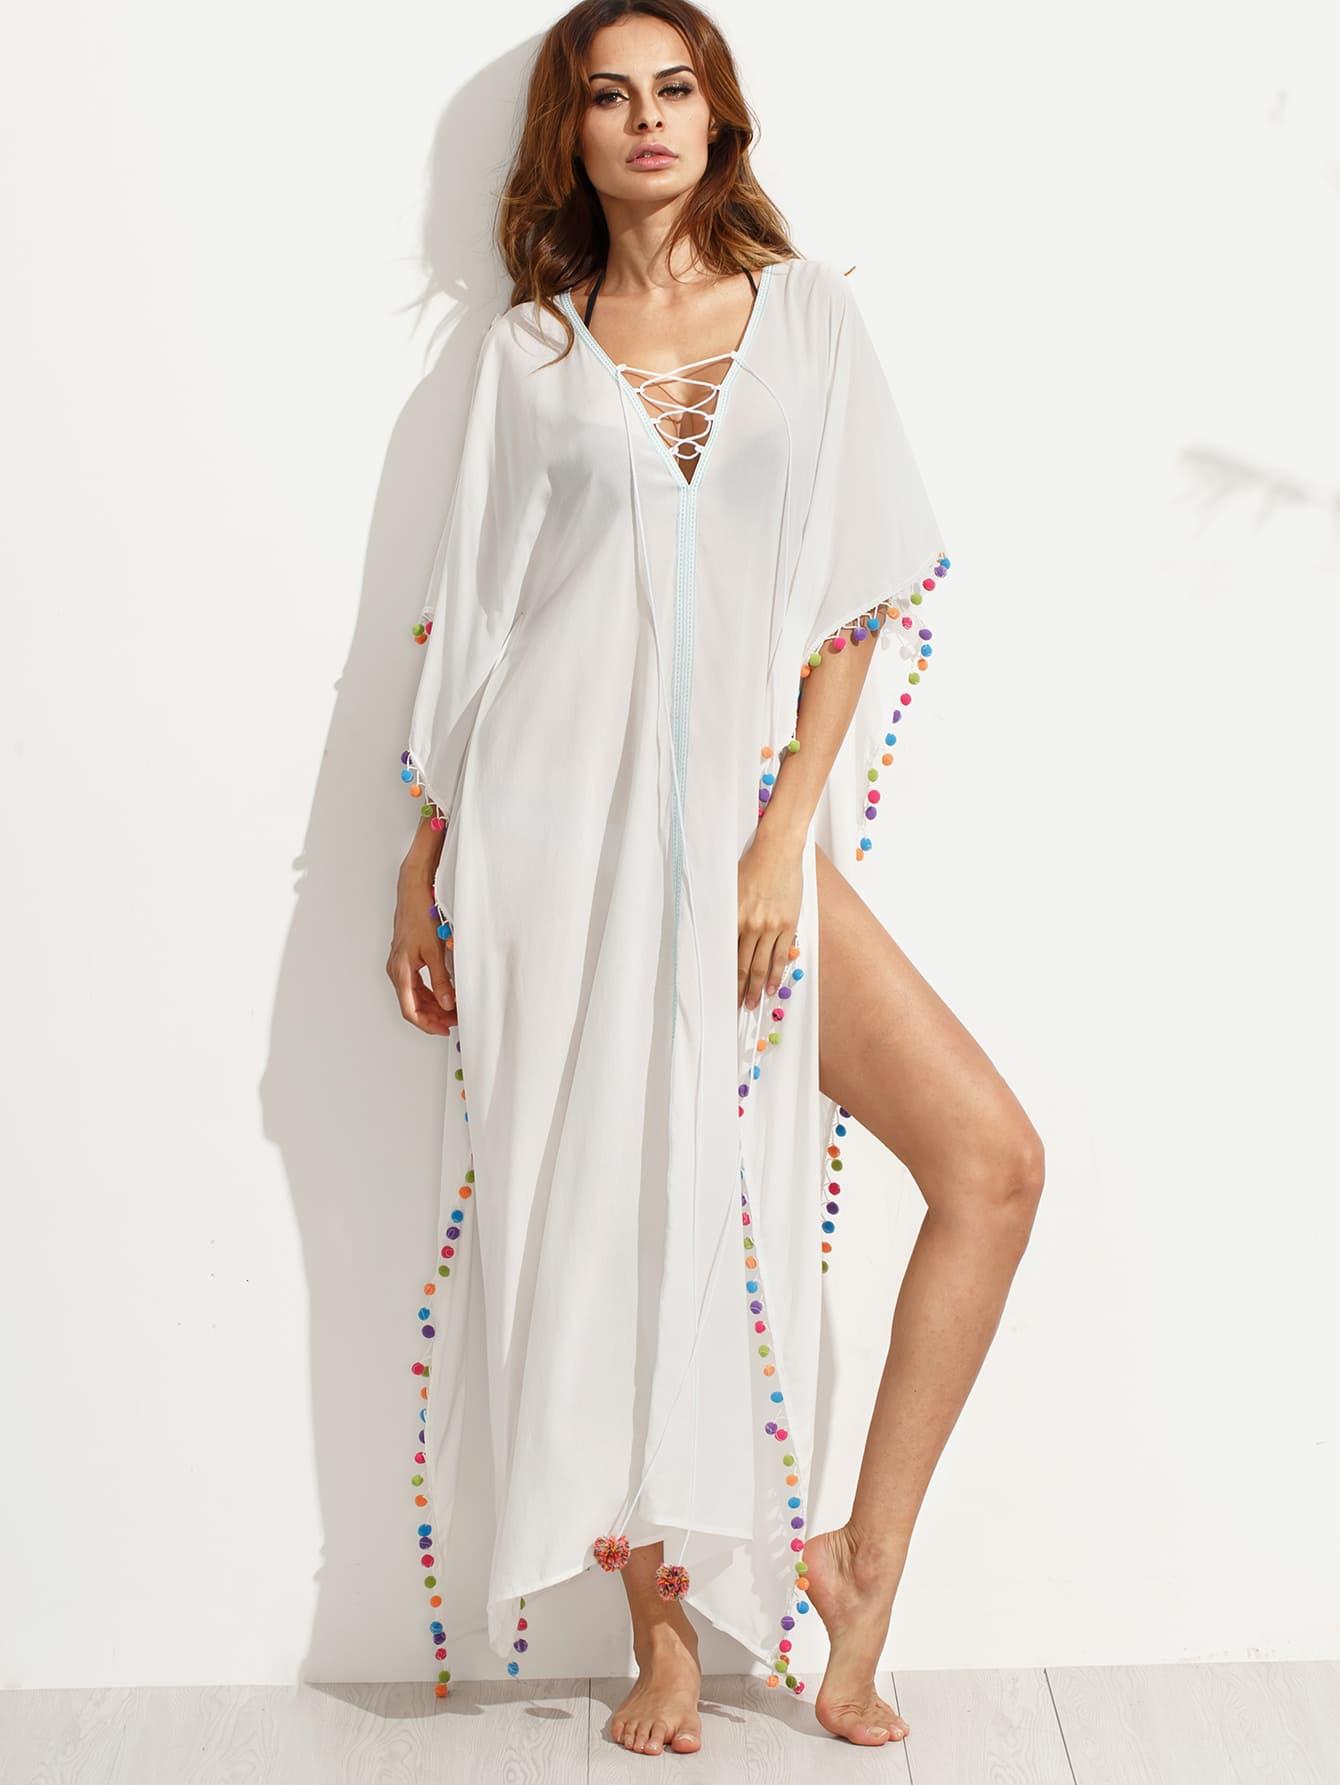 Lace-up V-cut Pom-pom Trim Split Beach Dress colorful pom pom trim slub tee